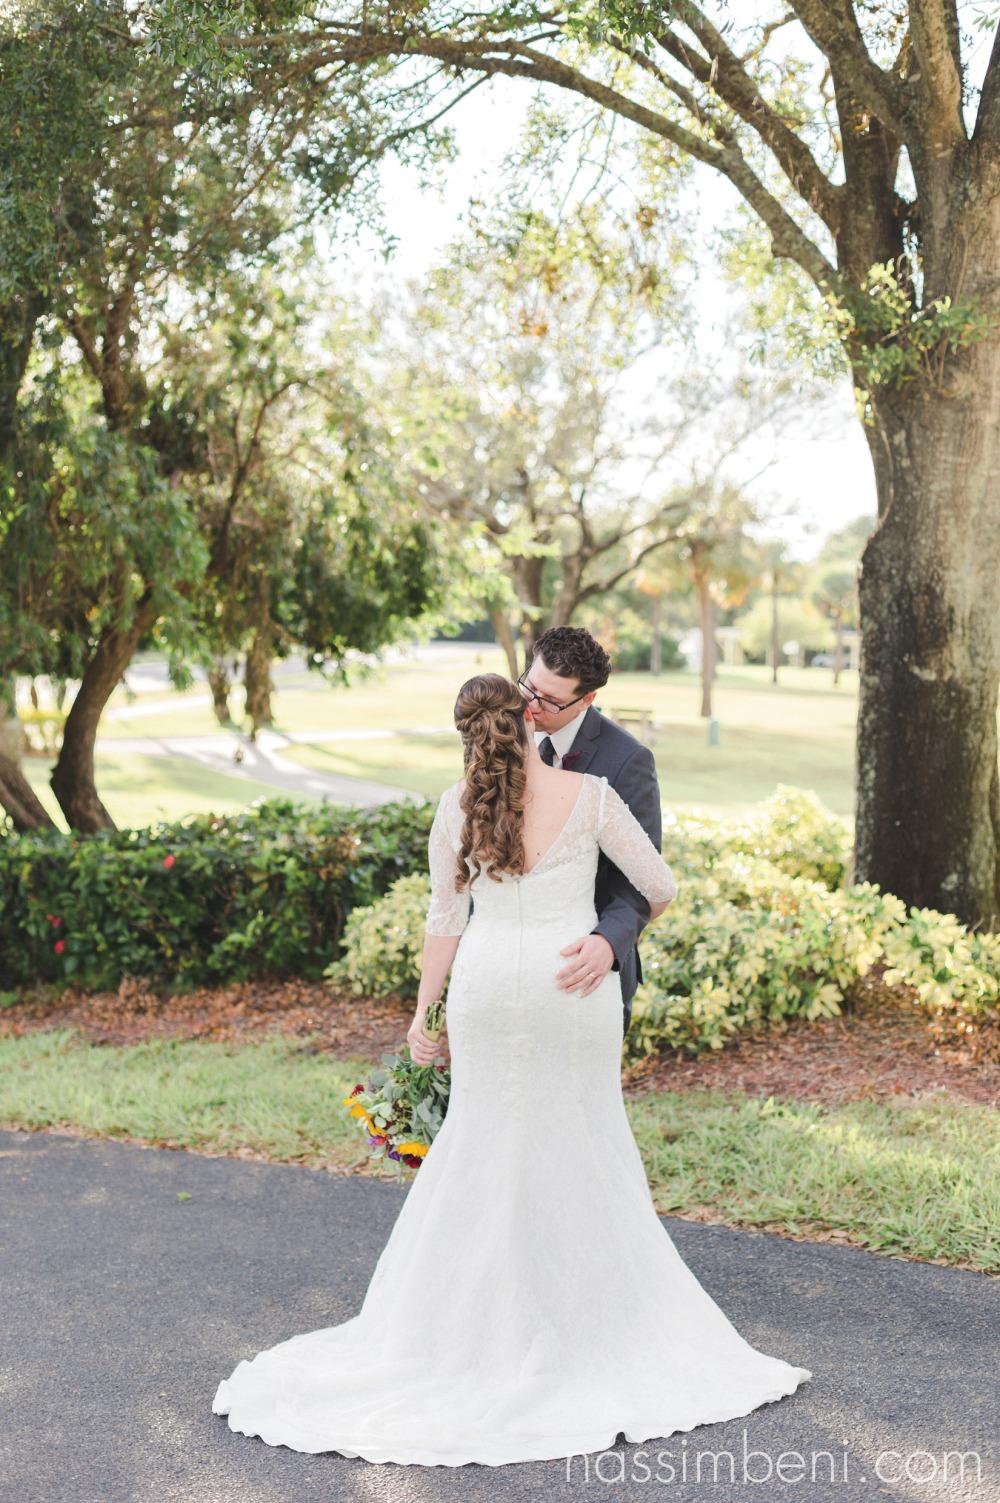 treasure-coast-wedding-photographer-in-port-st-lucie-wedding-nassimbeni-photography-53